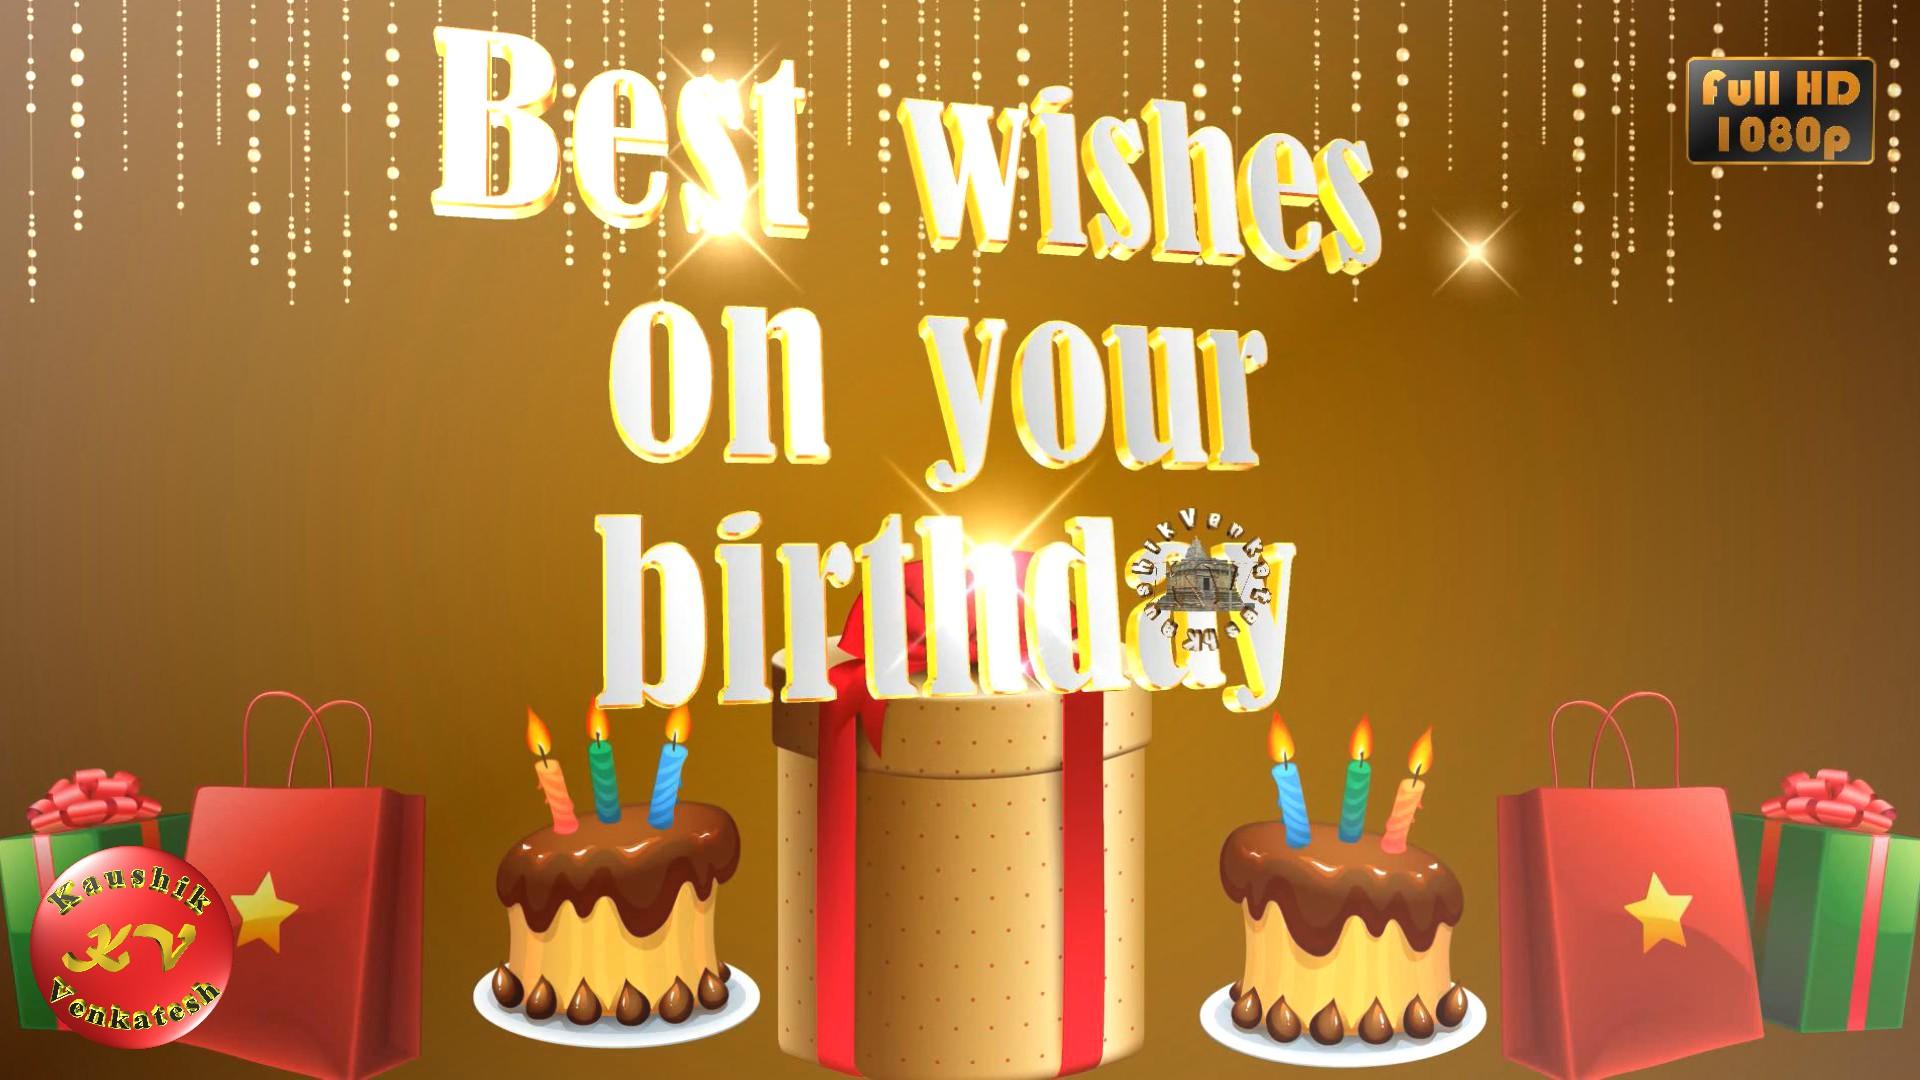 Latest Greetings Image for Birthday celebration.